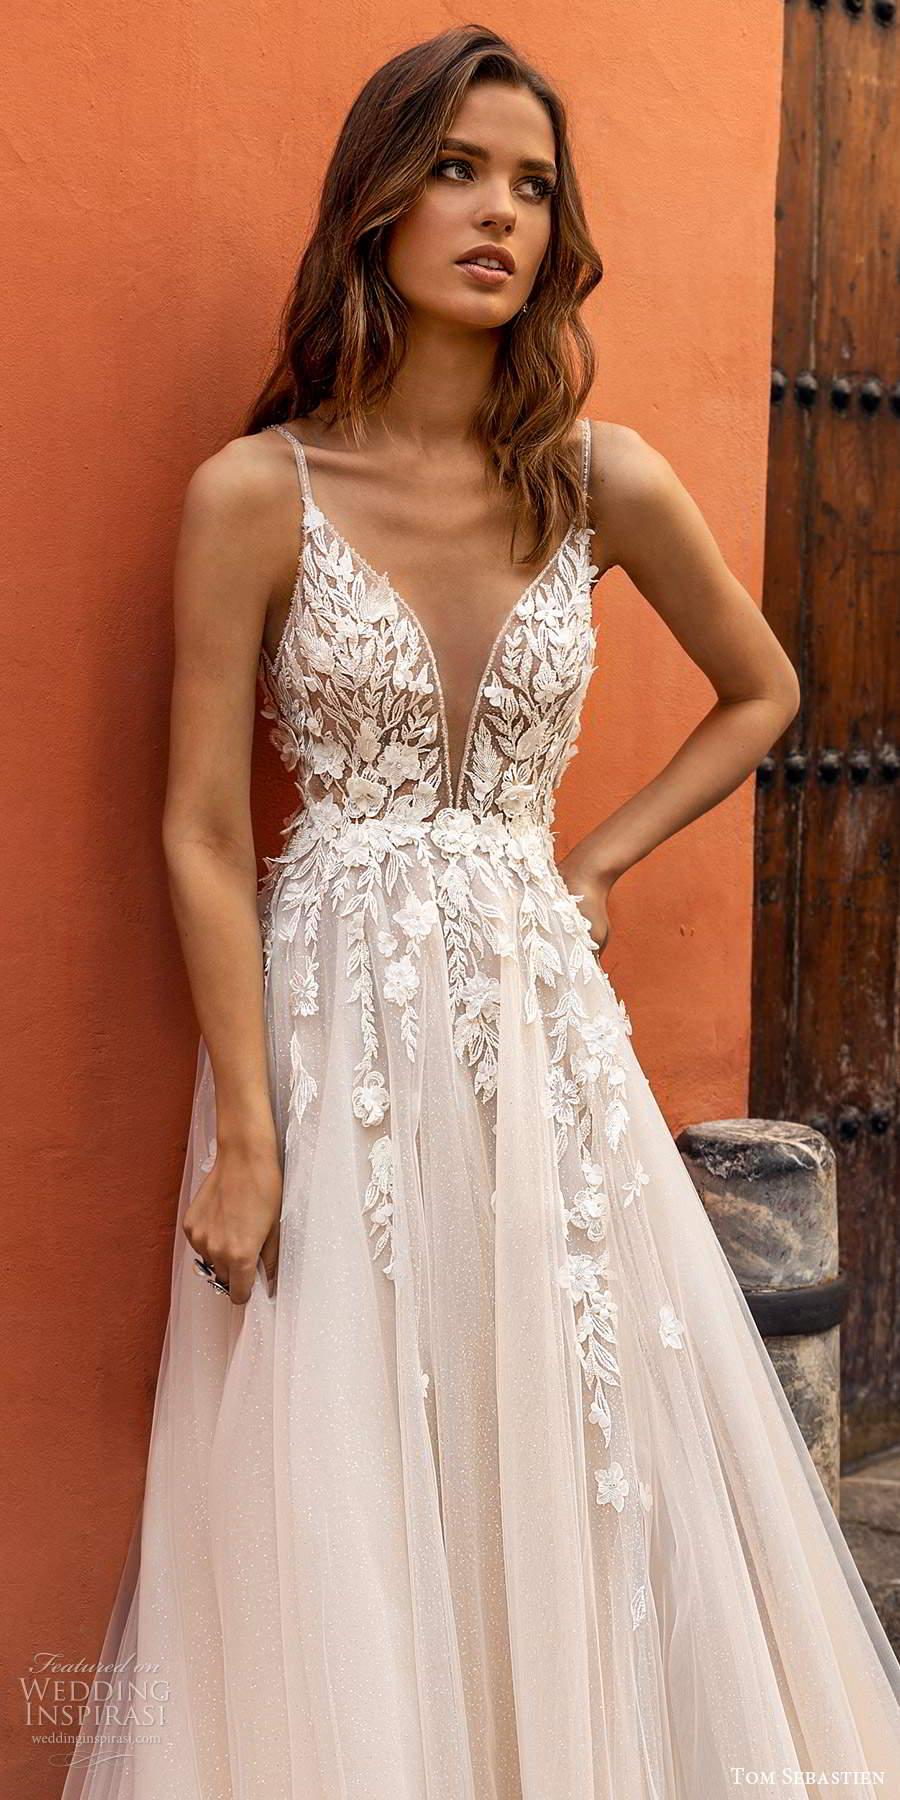 tom sebastien 2021 bridal sleeveless thin straps plunging v neckline embellished lace bodice a line ball gown wedding dress blush chapel train (18) mv